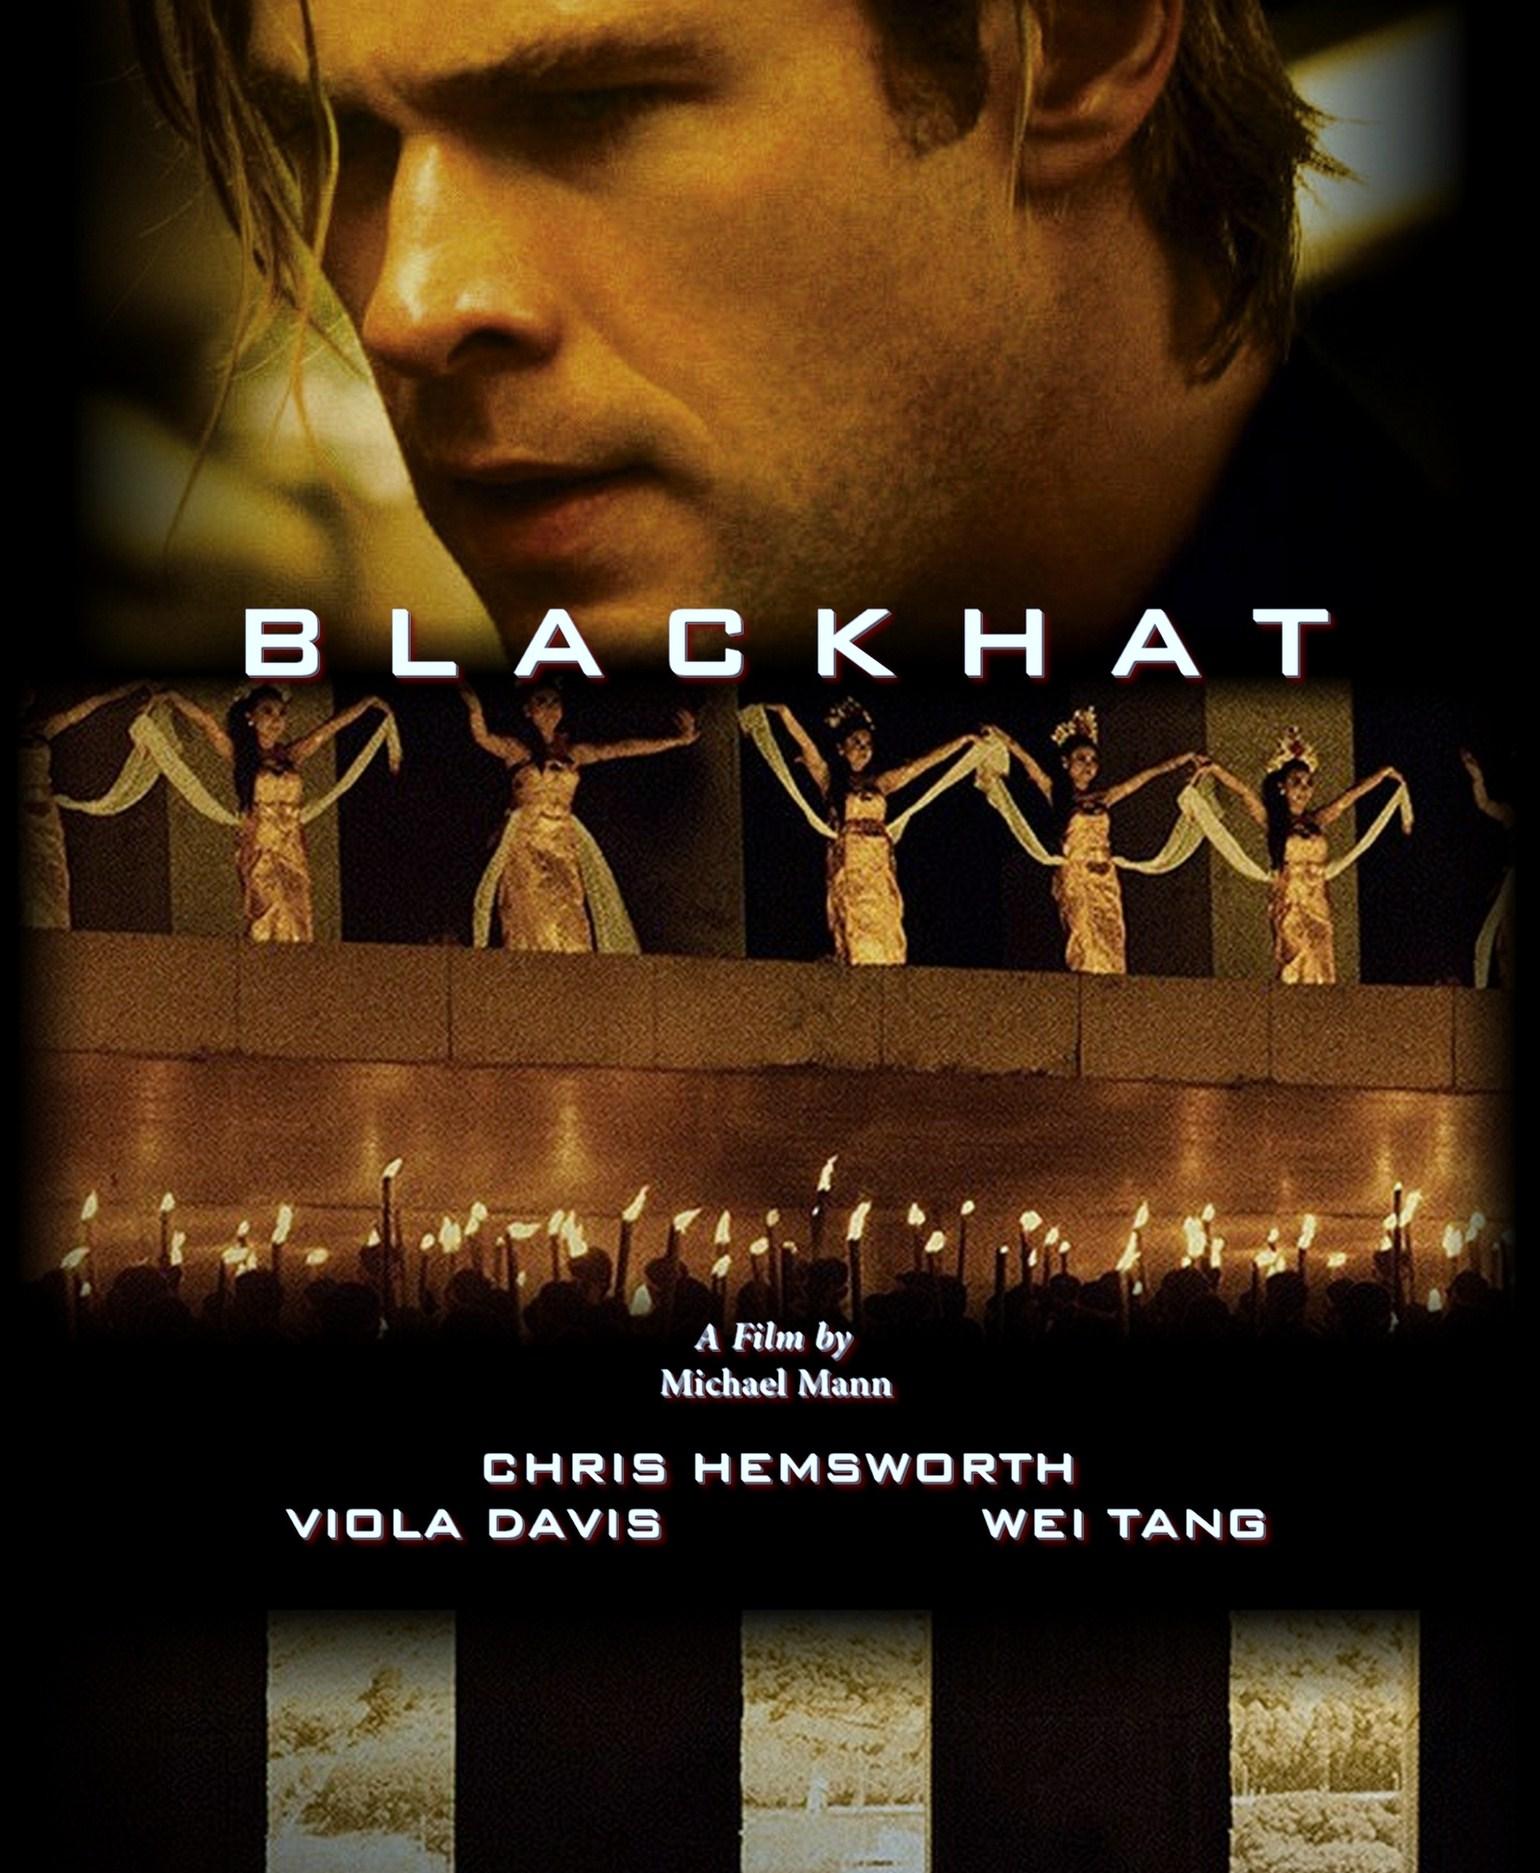 c66bea5565b Nice movie - BLACKHAT Audience Review - MouthShut.com